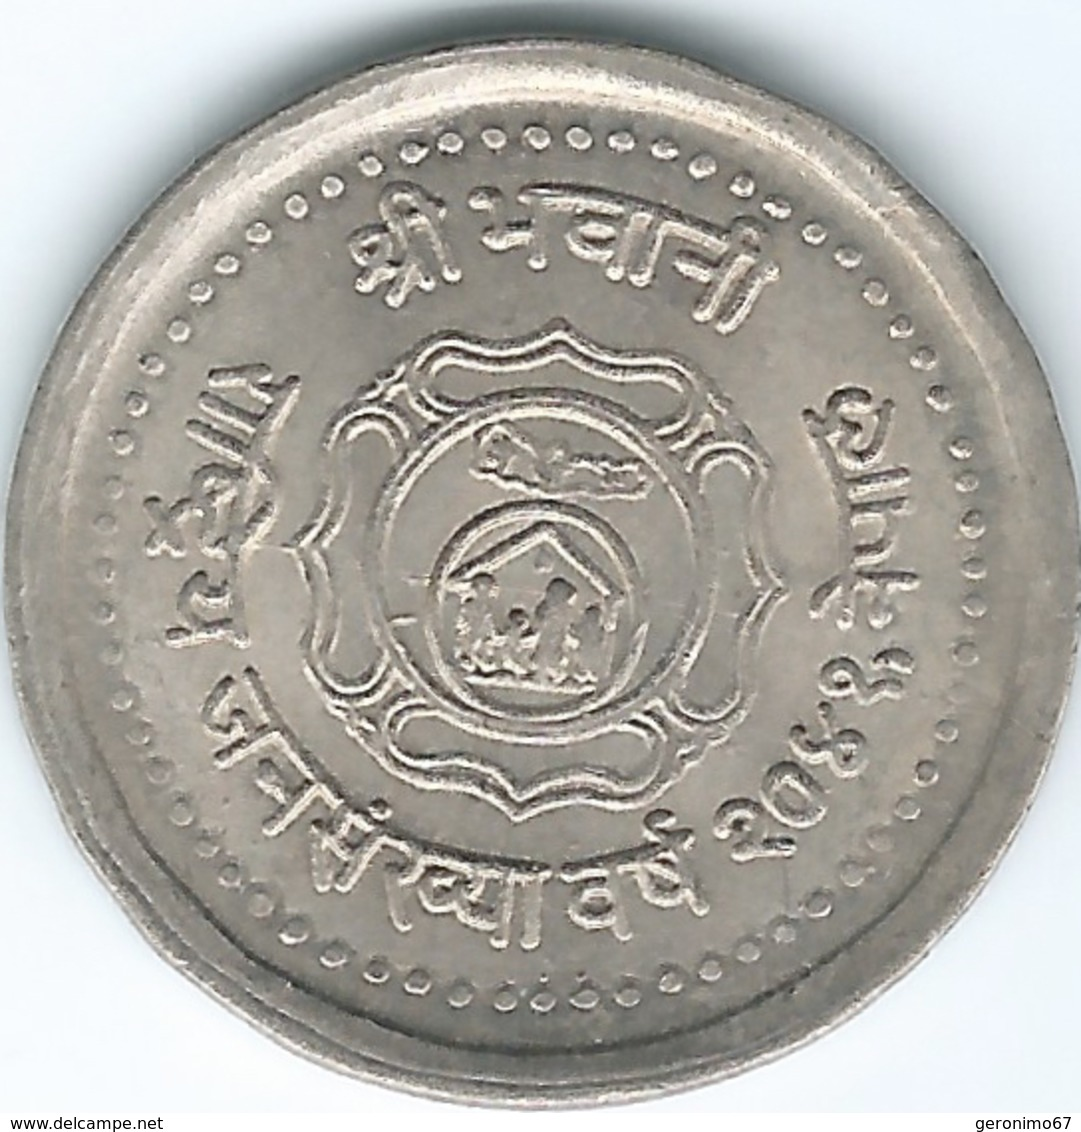 Nepal - Birendra - VS2041 (1984 -२०४१) - 1 Rupee - National Population Year - KM1019 - Nepal